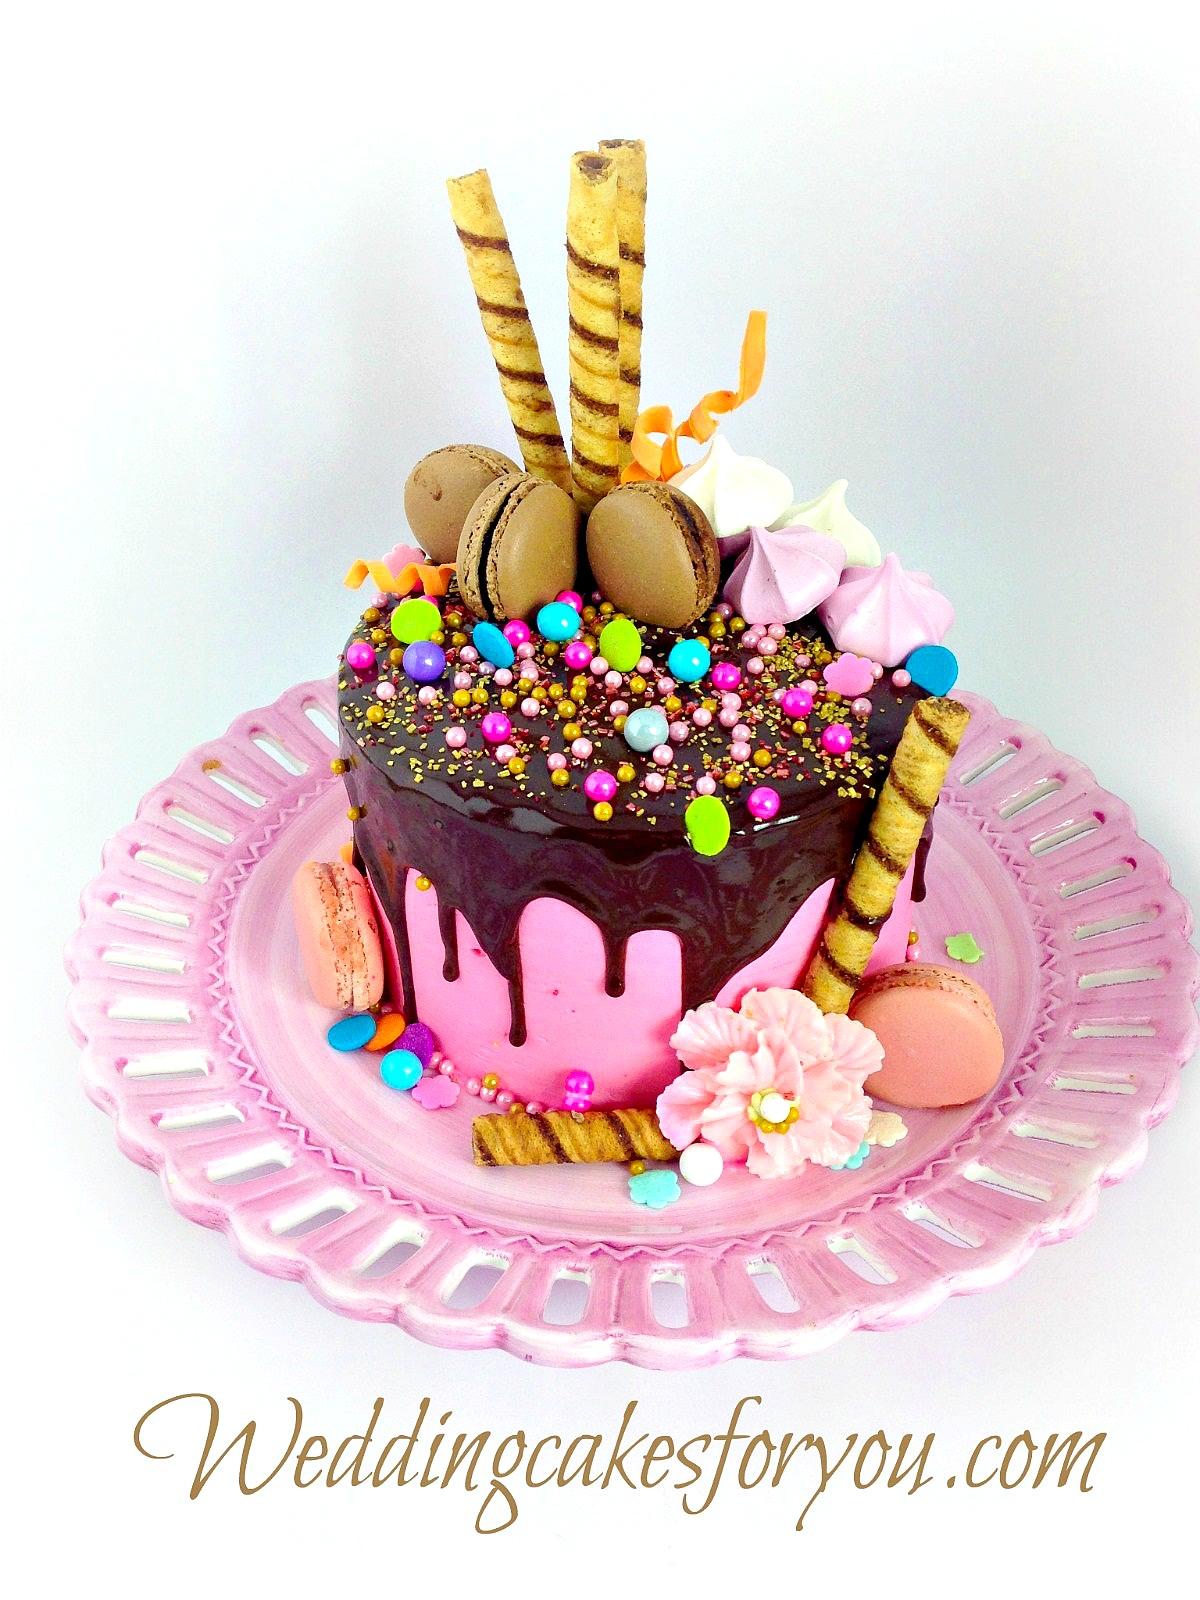 chocolate drip cake loaded up